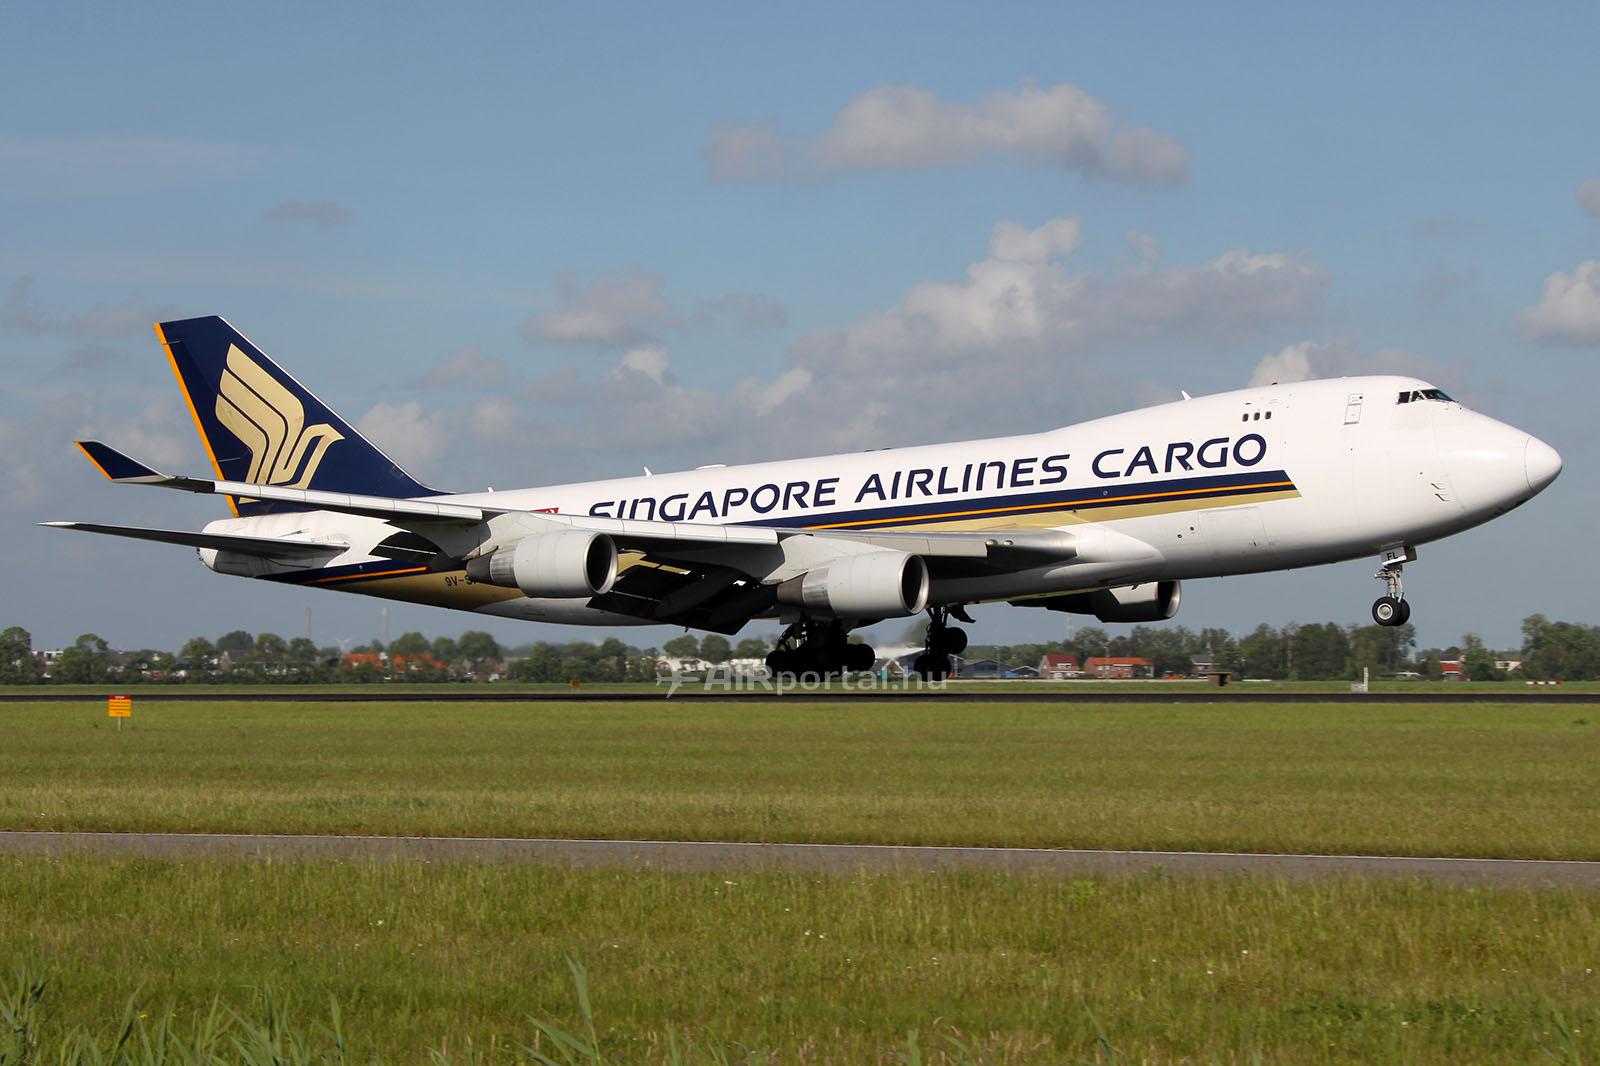 A Singapore Airlines Cargo Boeing 747-400-as repülőgépe. (Fotó AIRportal.hu) | © AIRportal.hu